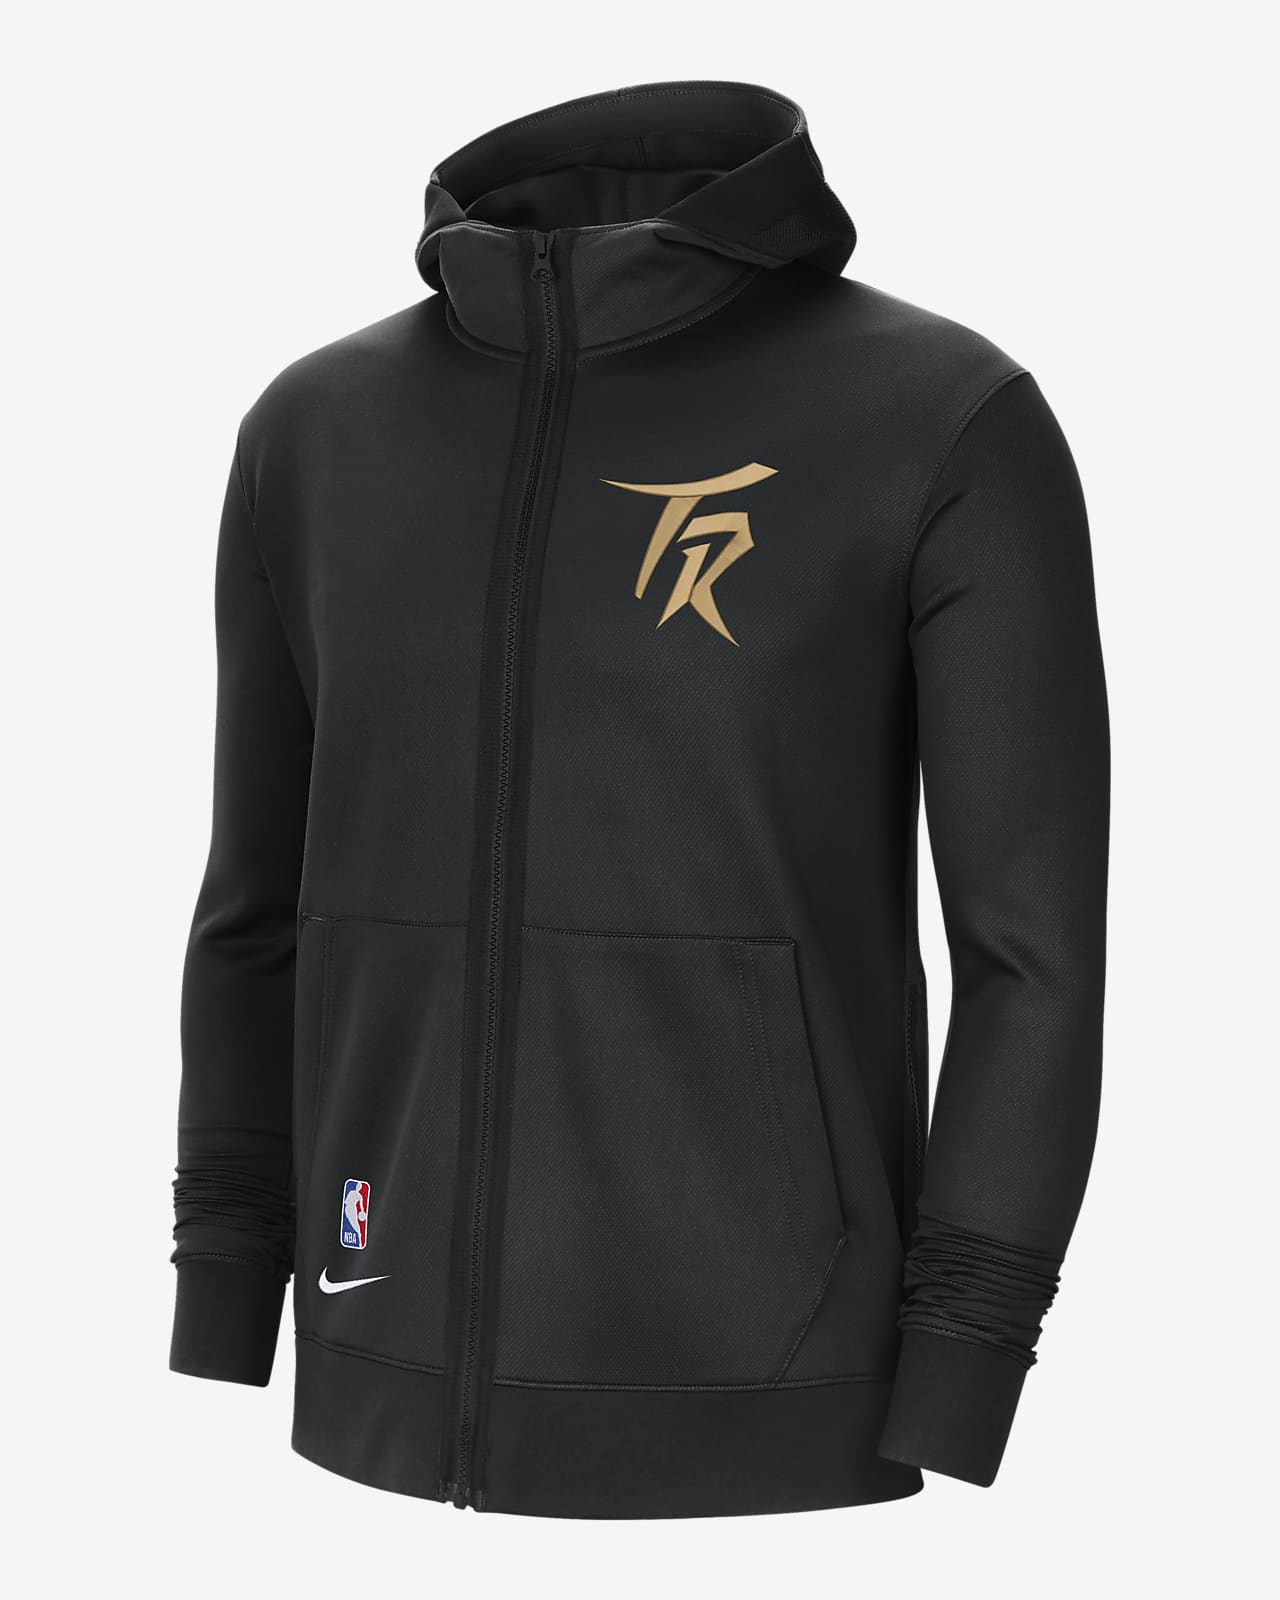 Toronto Raptors Showtime City Edition Men's Nike Therma Flex NBA Hoodie